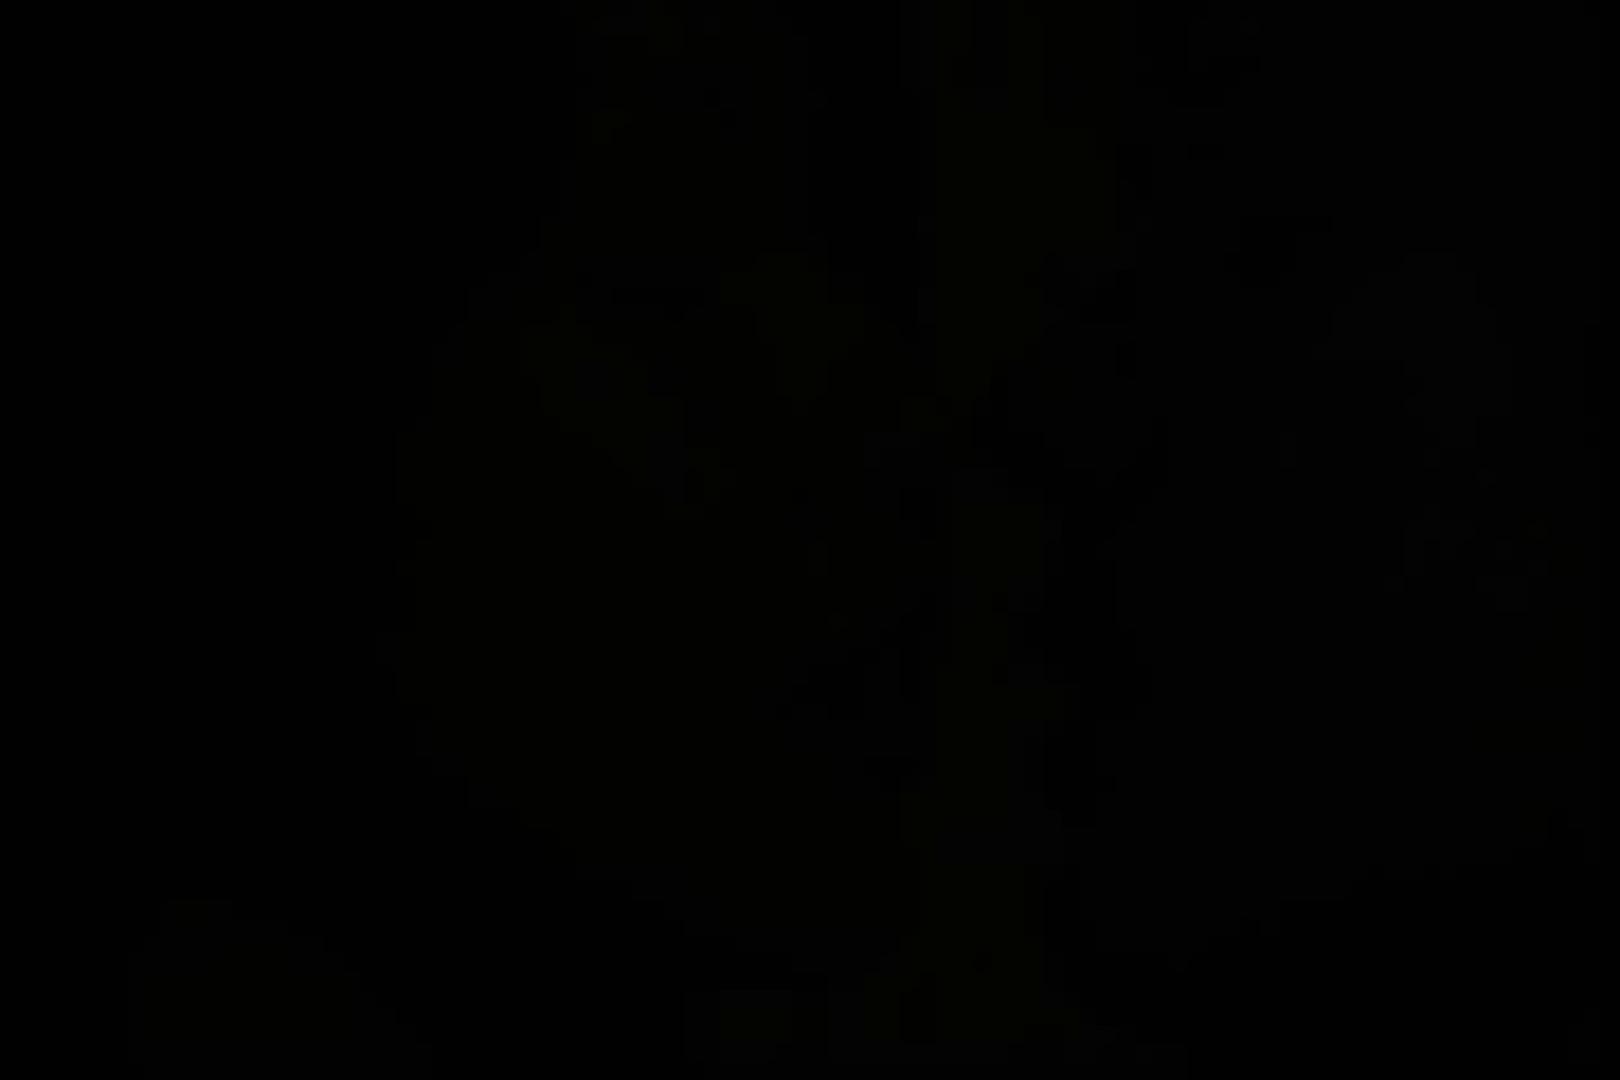 Hなフェロモン漂わせまくりな美人妻 佐々木薫子 エッチな人妻 | おっぱい特集  73pic 7